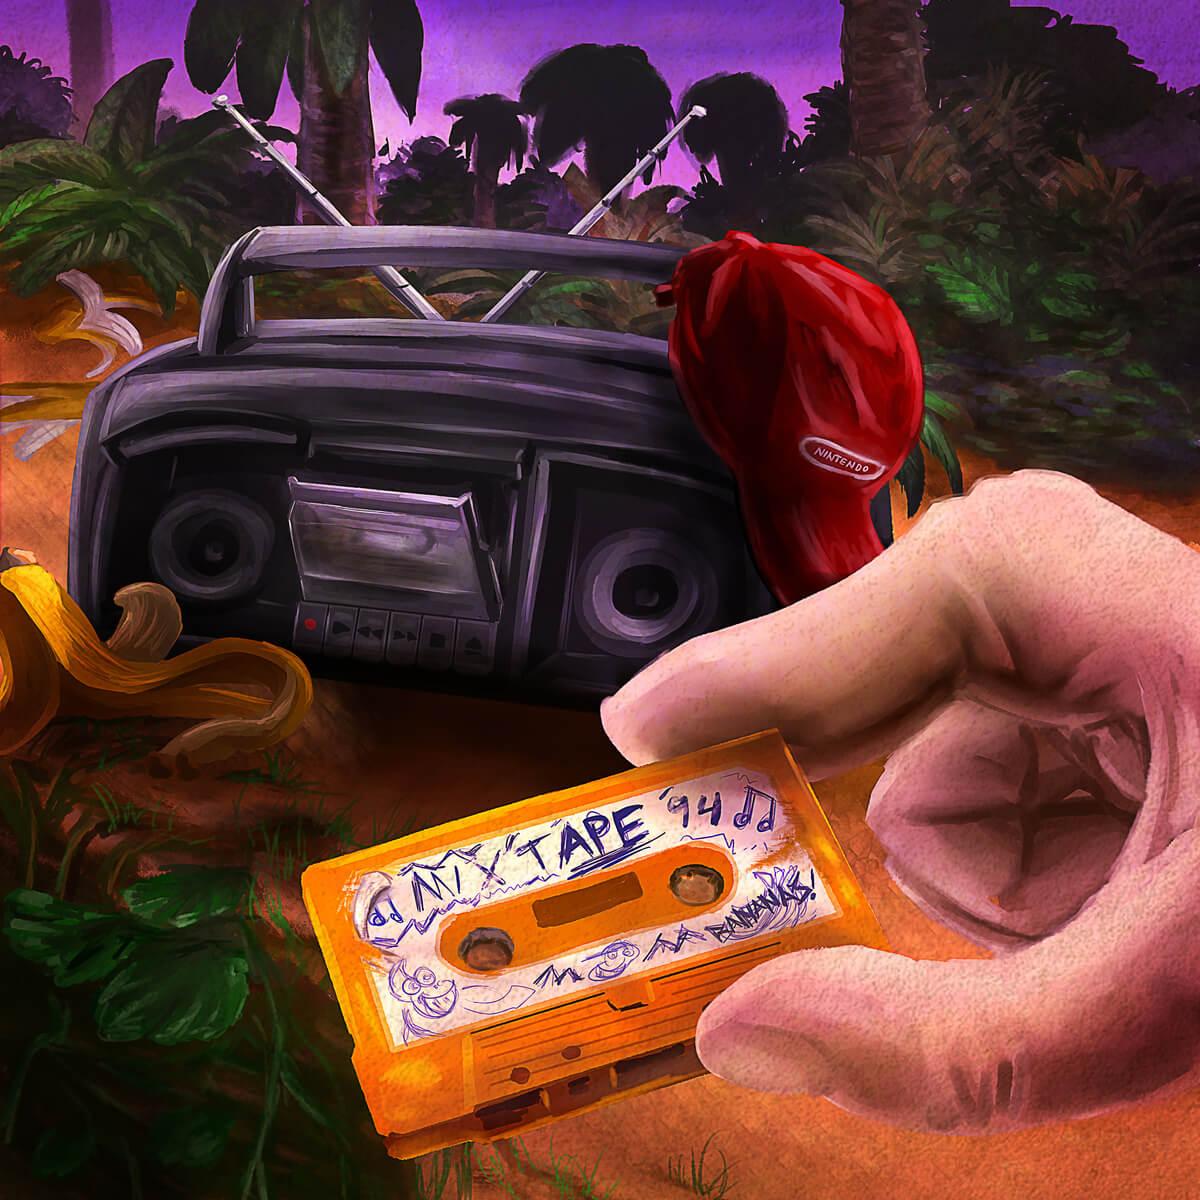 donkey-kong-country-dkc-mixtape-mixt-ape-94-video-game-music-tribute-album